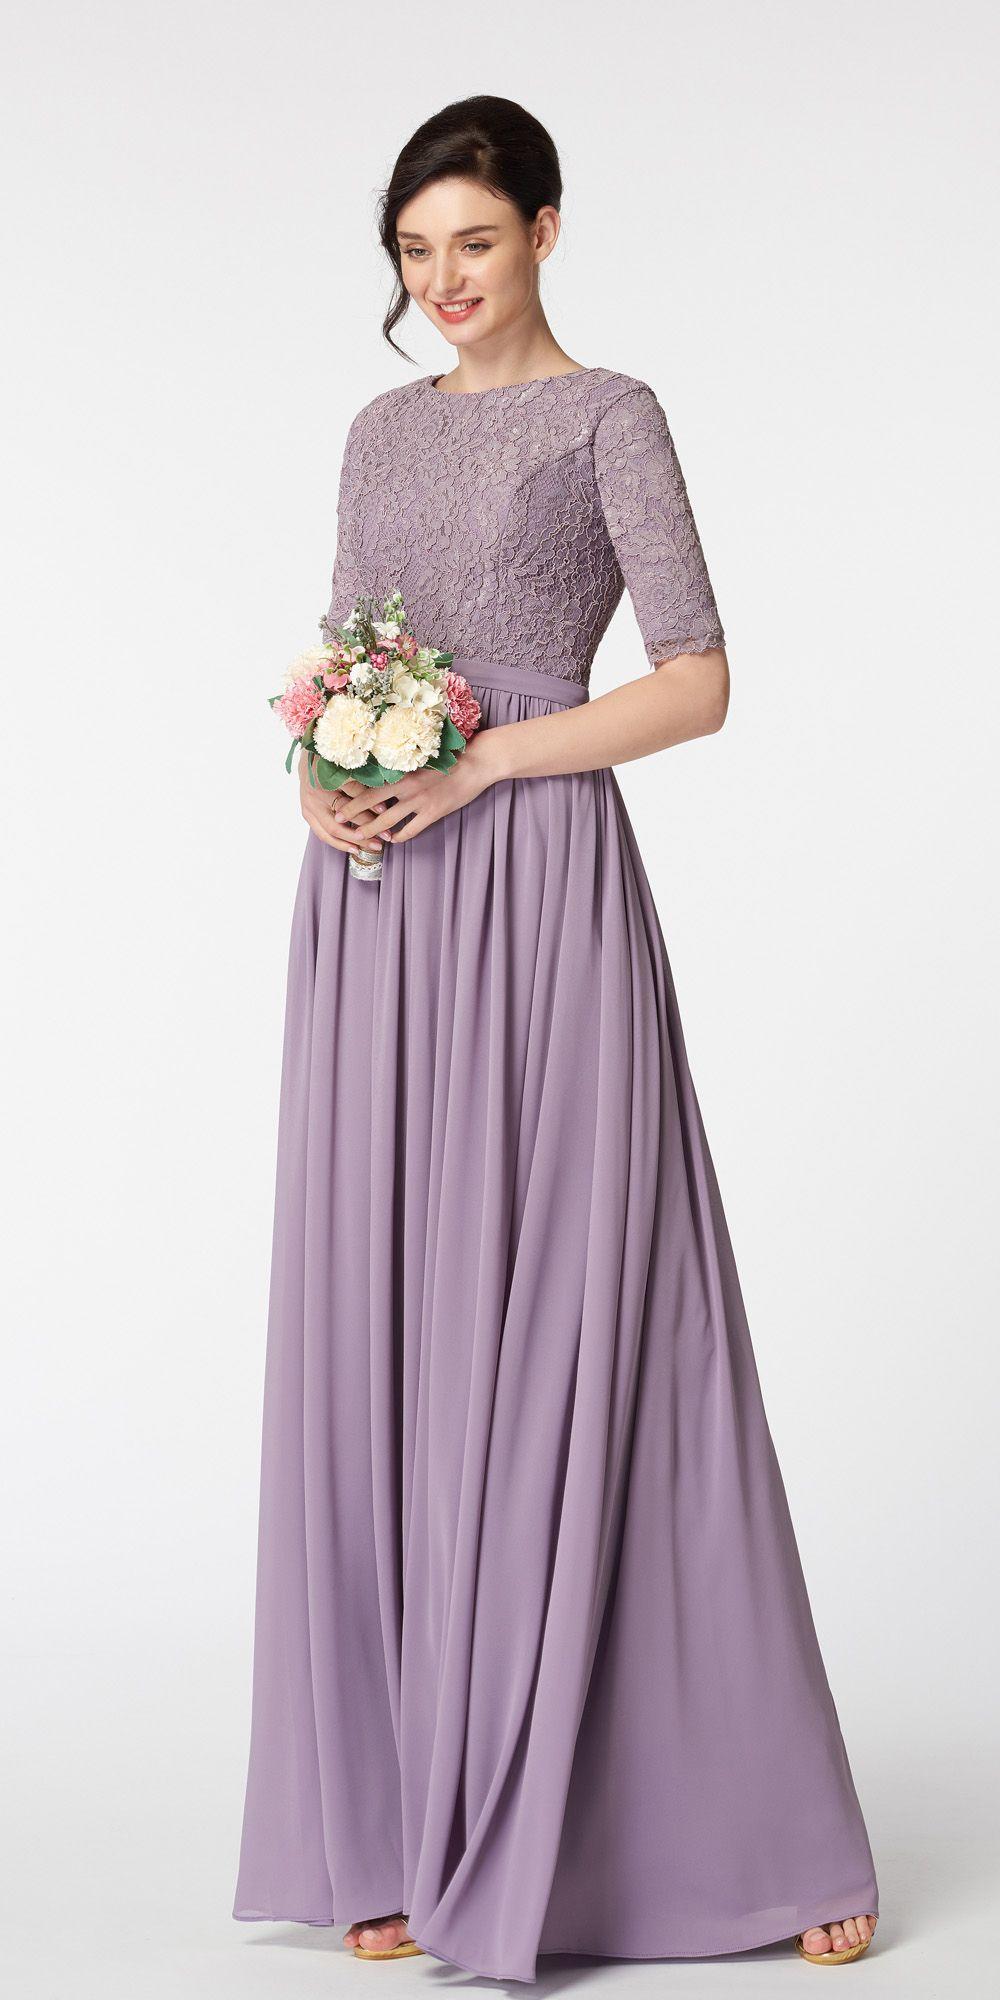 Wisteria Purple Modest Bridesmaid Dress With Elbow Sleeves Modest Bridesmaid Dresses Bridesmaid Dresses With Sleeves Bridesmaid Gown [ 2000 x 1000 Pixel ]